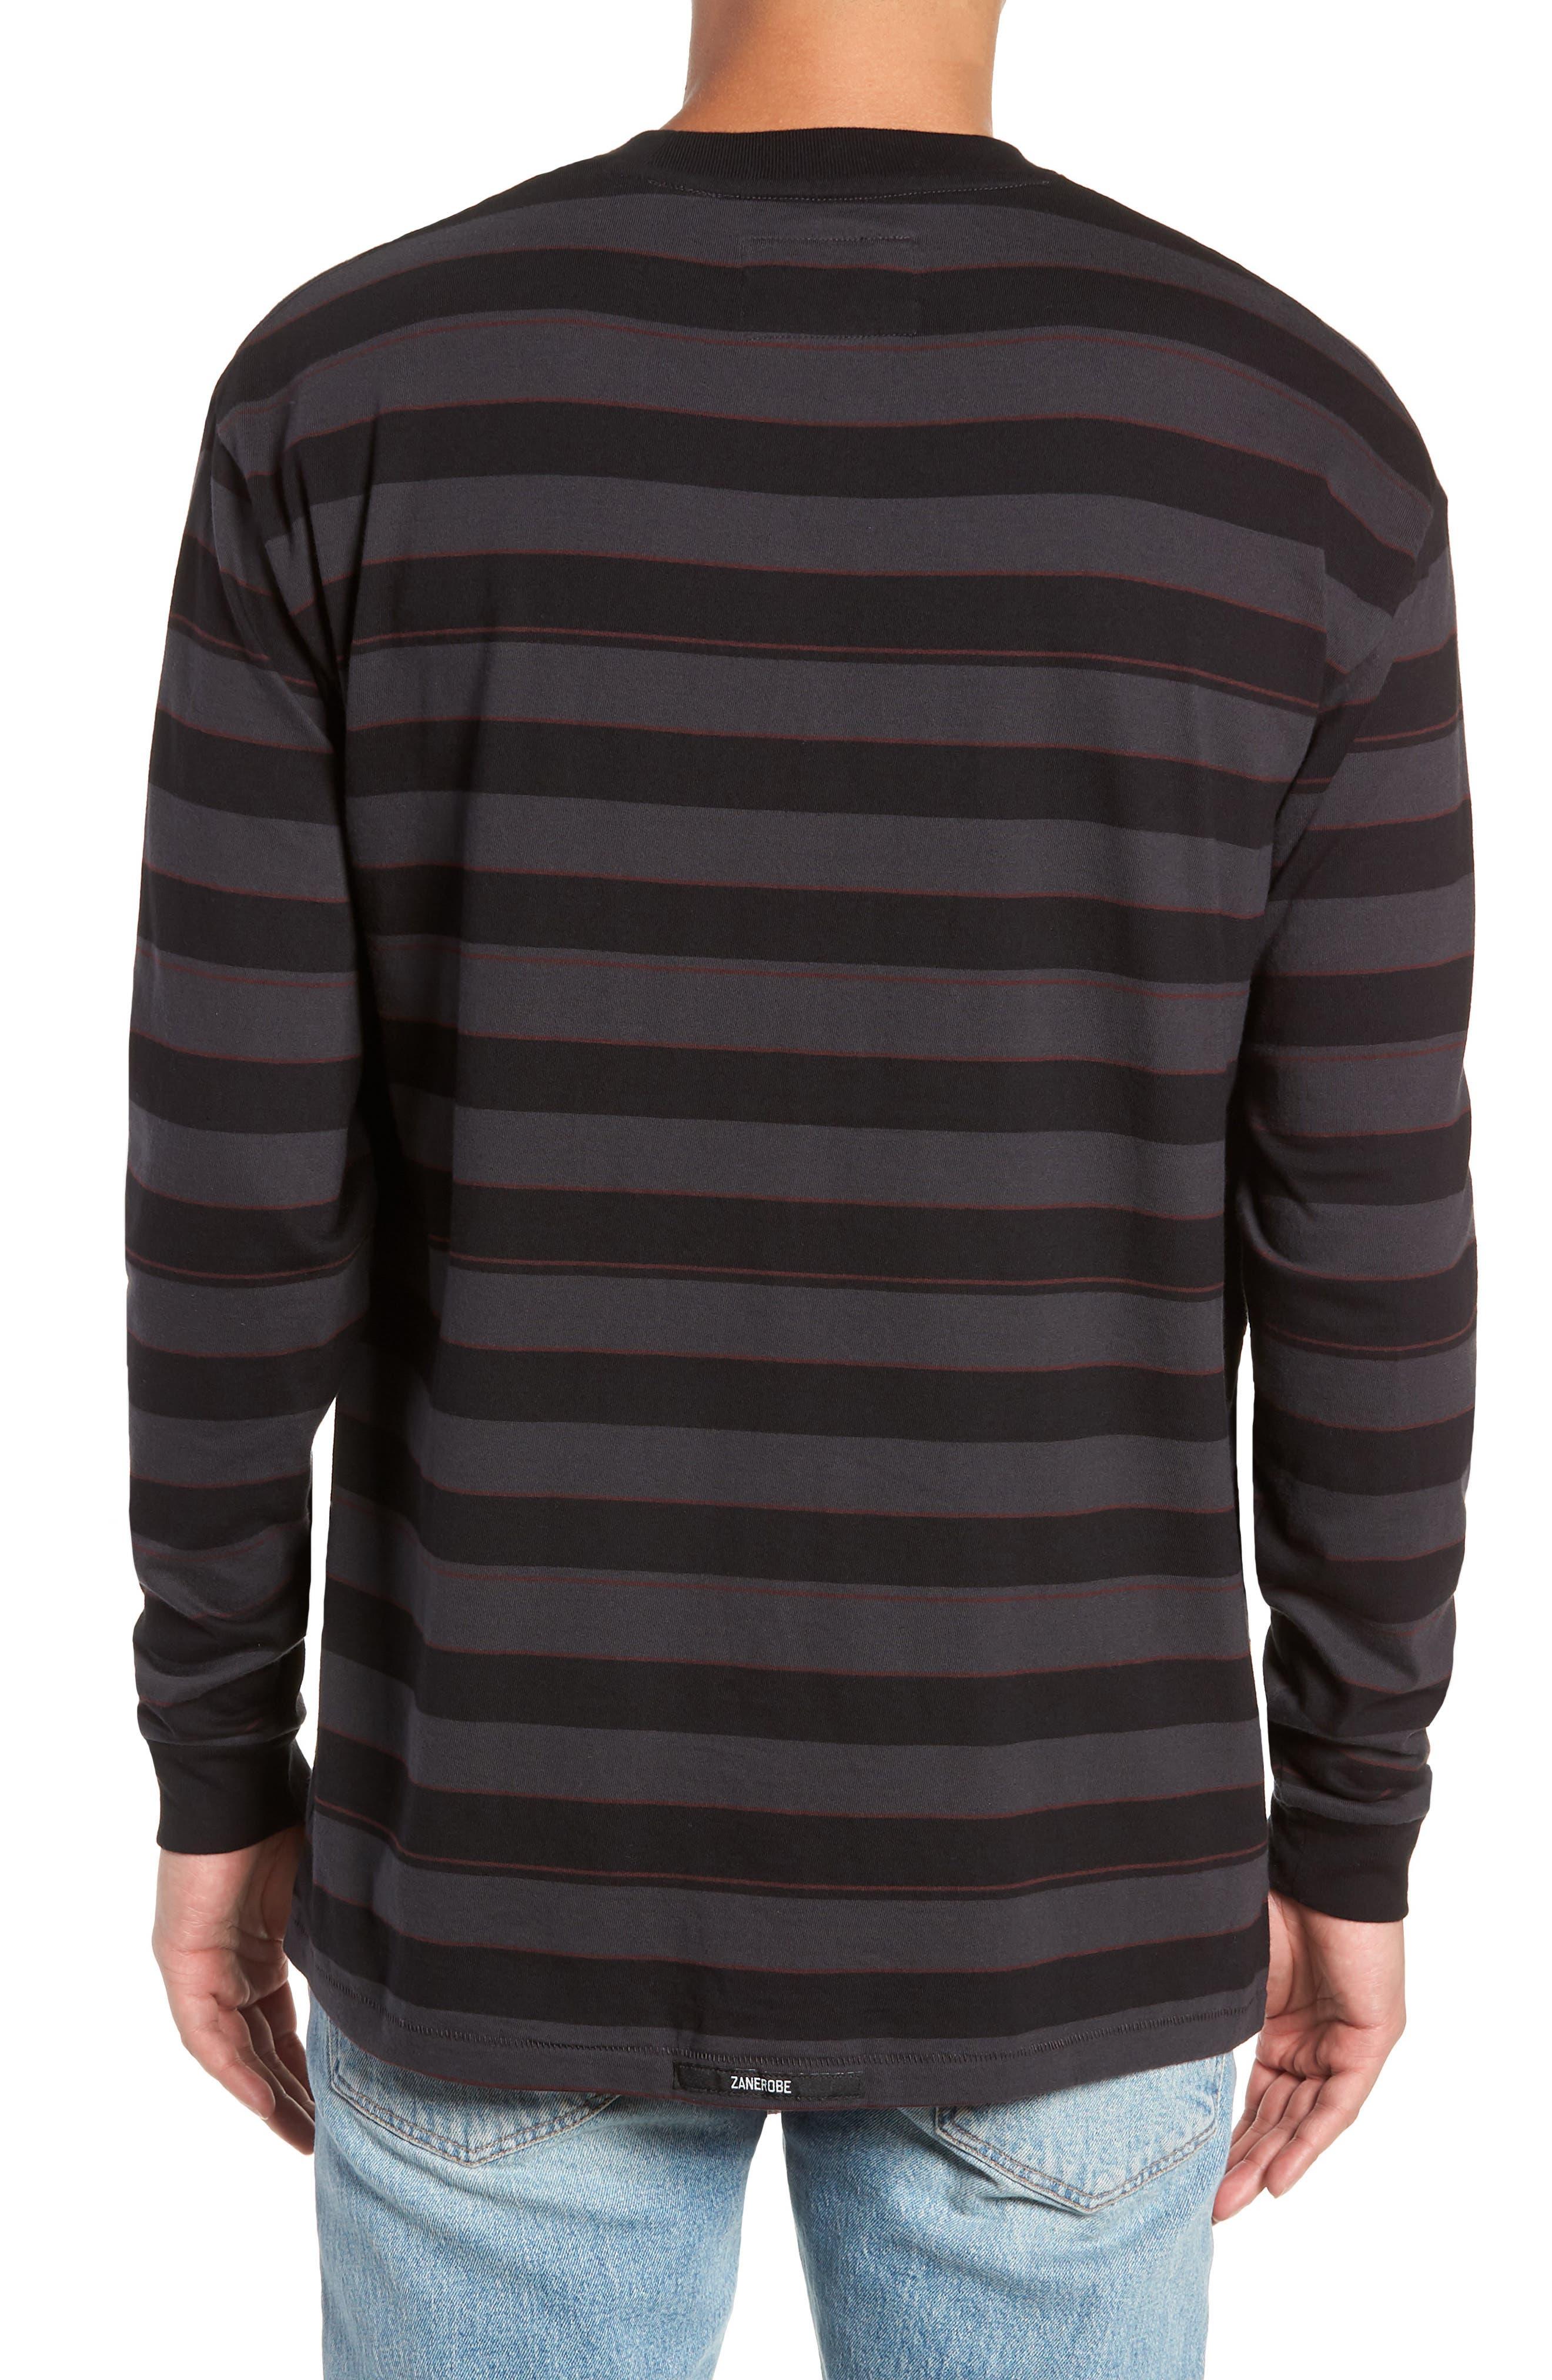 Hoop Box Long Sleeve T-Shirt,                             Alternate thumbnail 2, color,                             VINTAGE BLACK/ BLACK